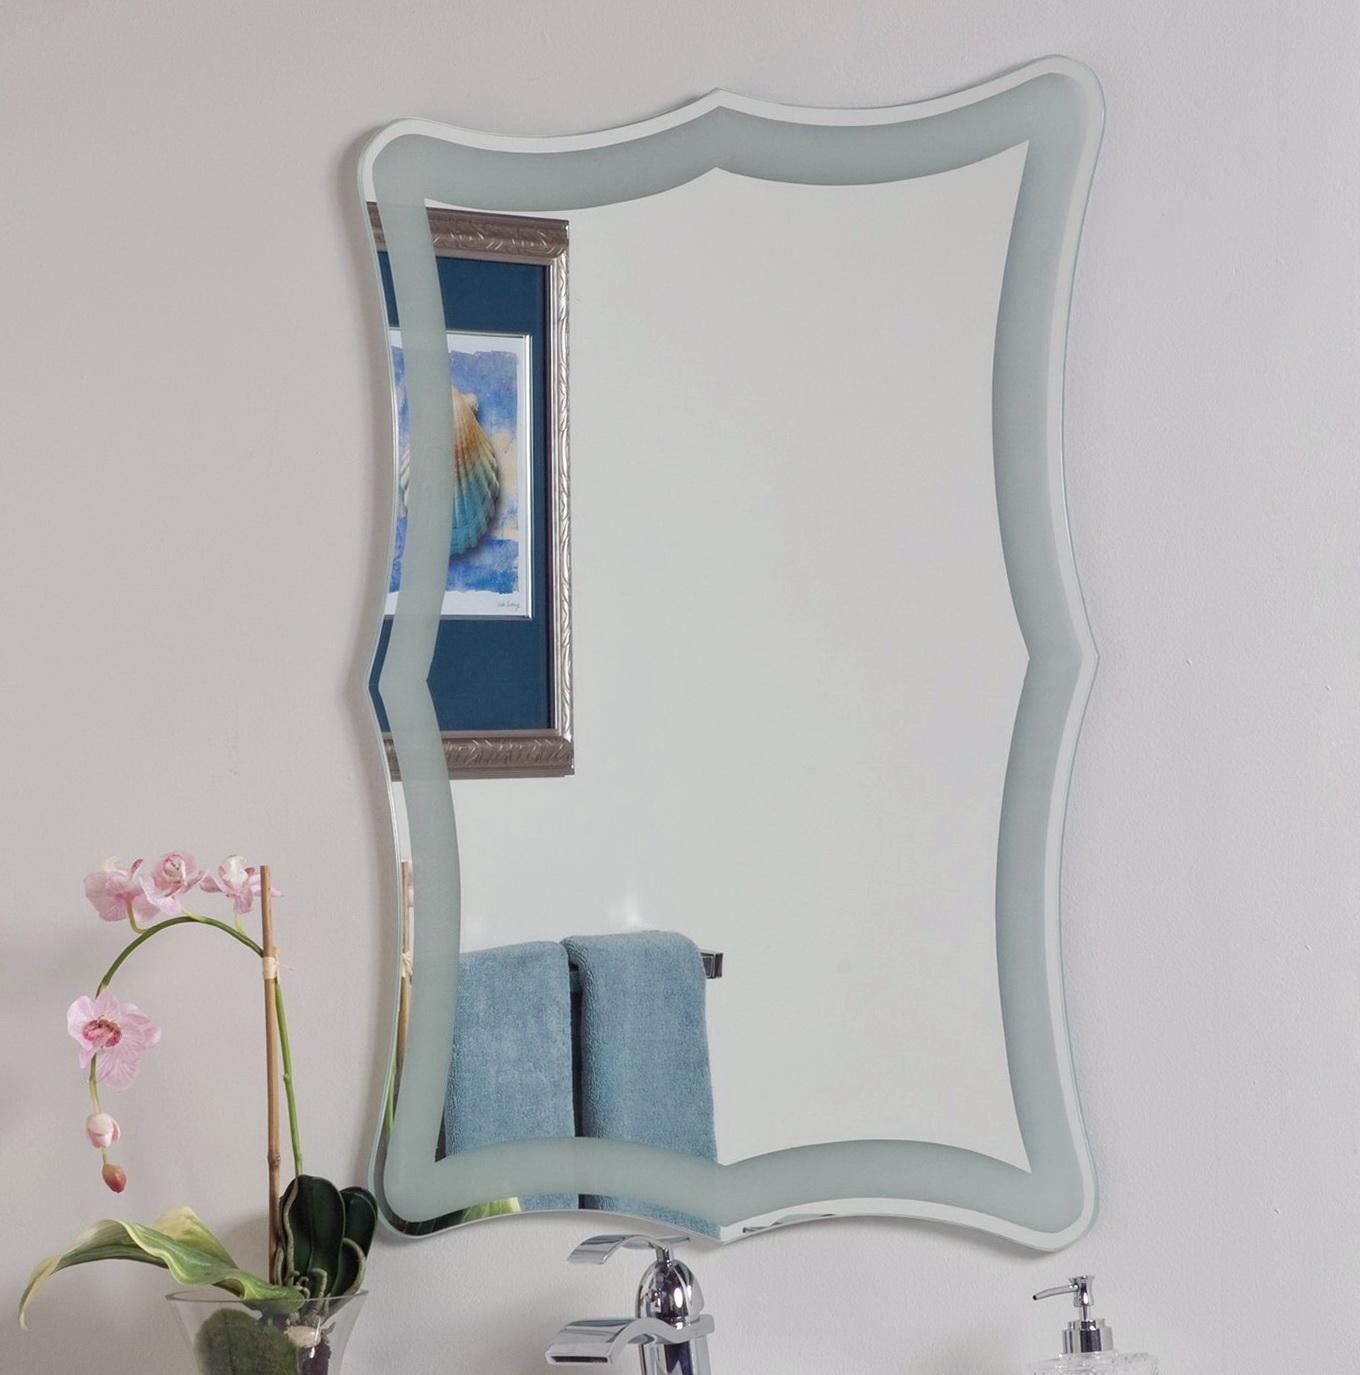 Frameless Bathroom Mirrors Lowes  Home Design Ideas